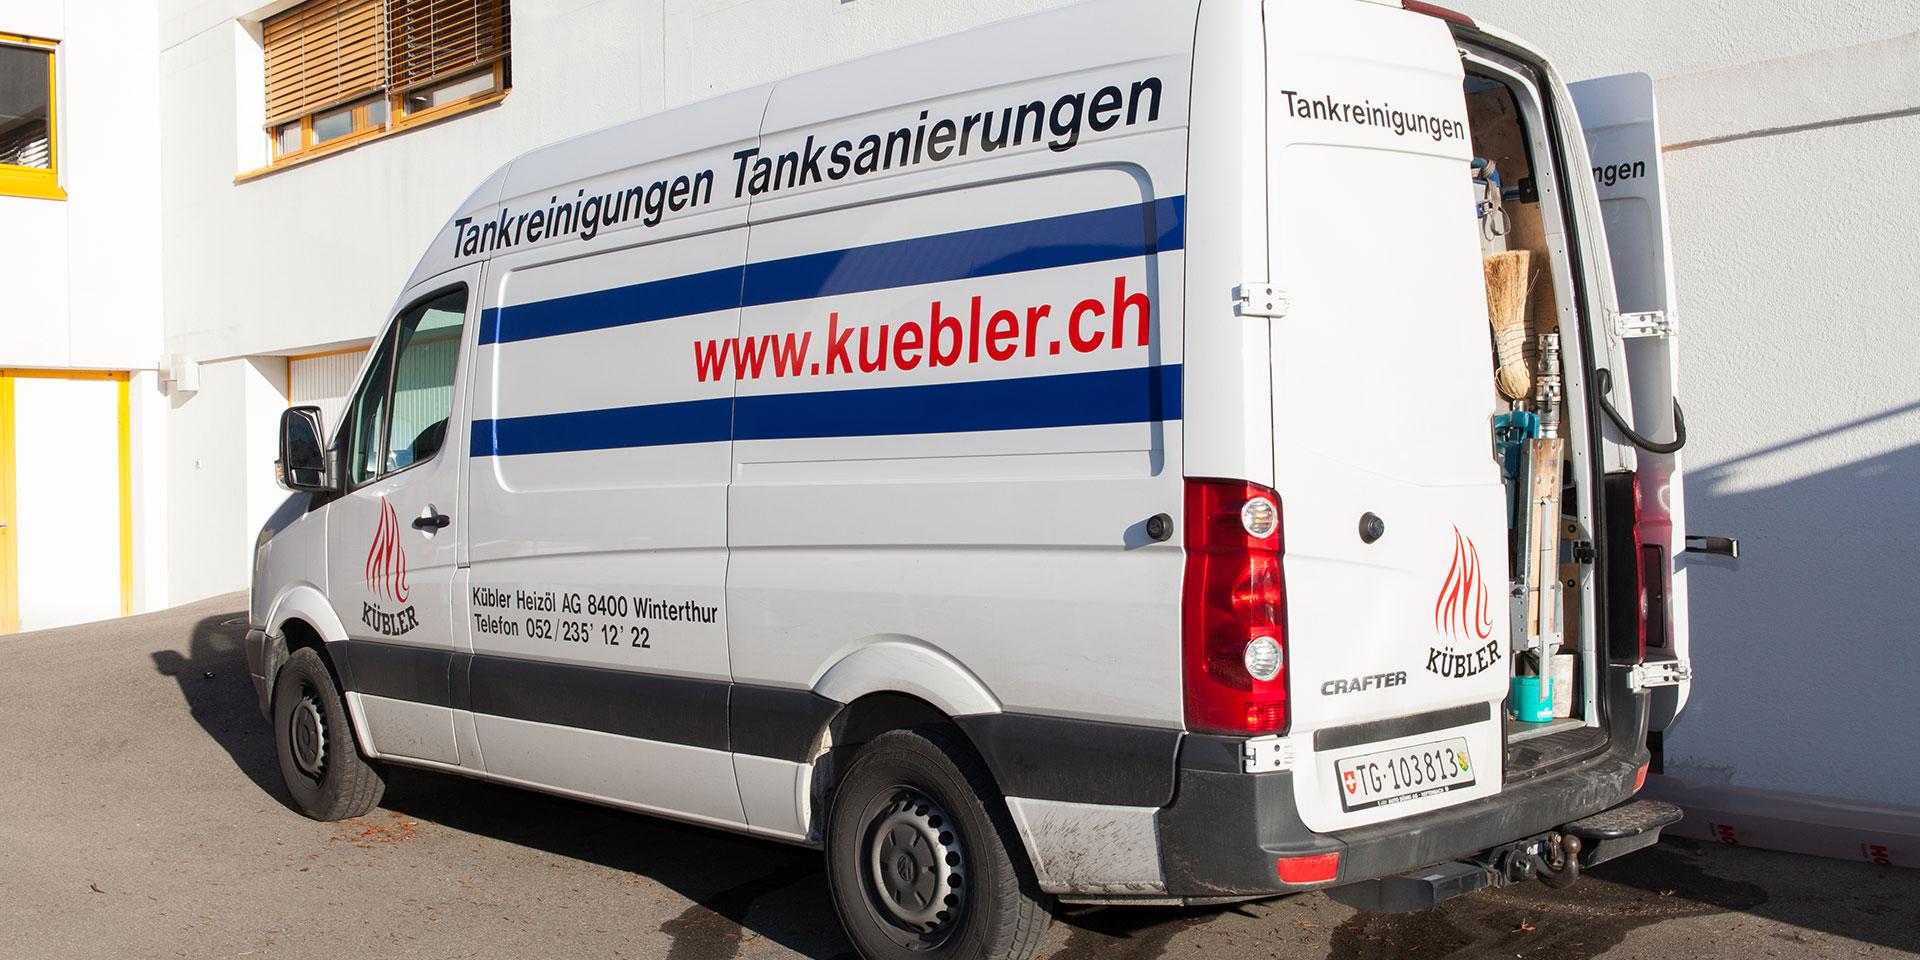 Headerbilder_9_kuebler_heizoel_ag